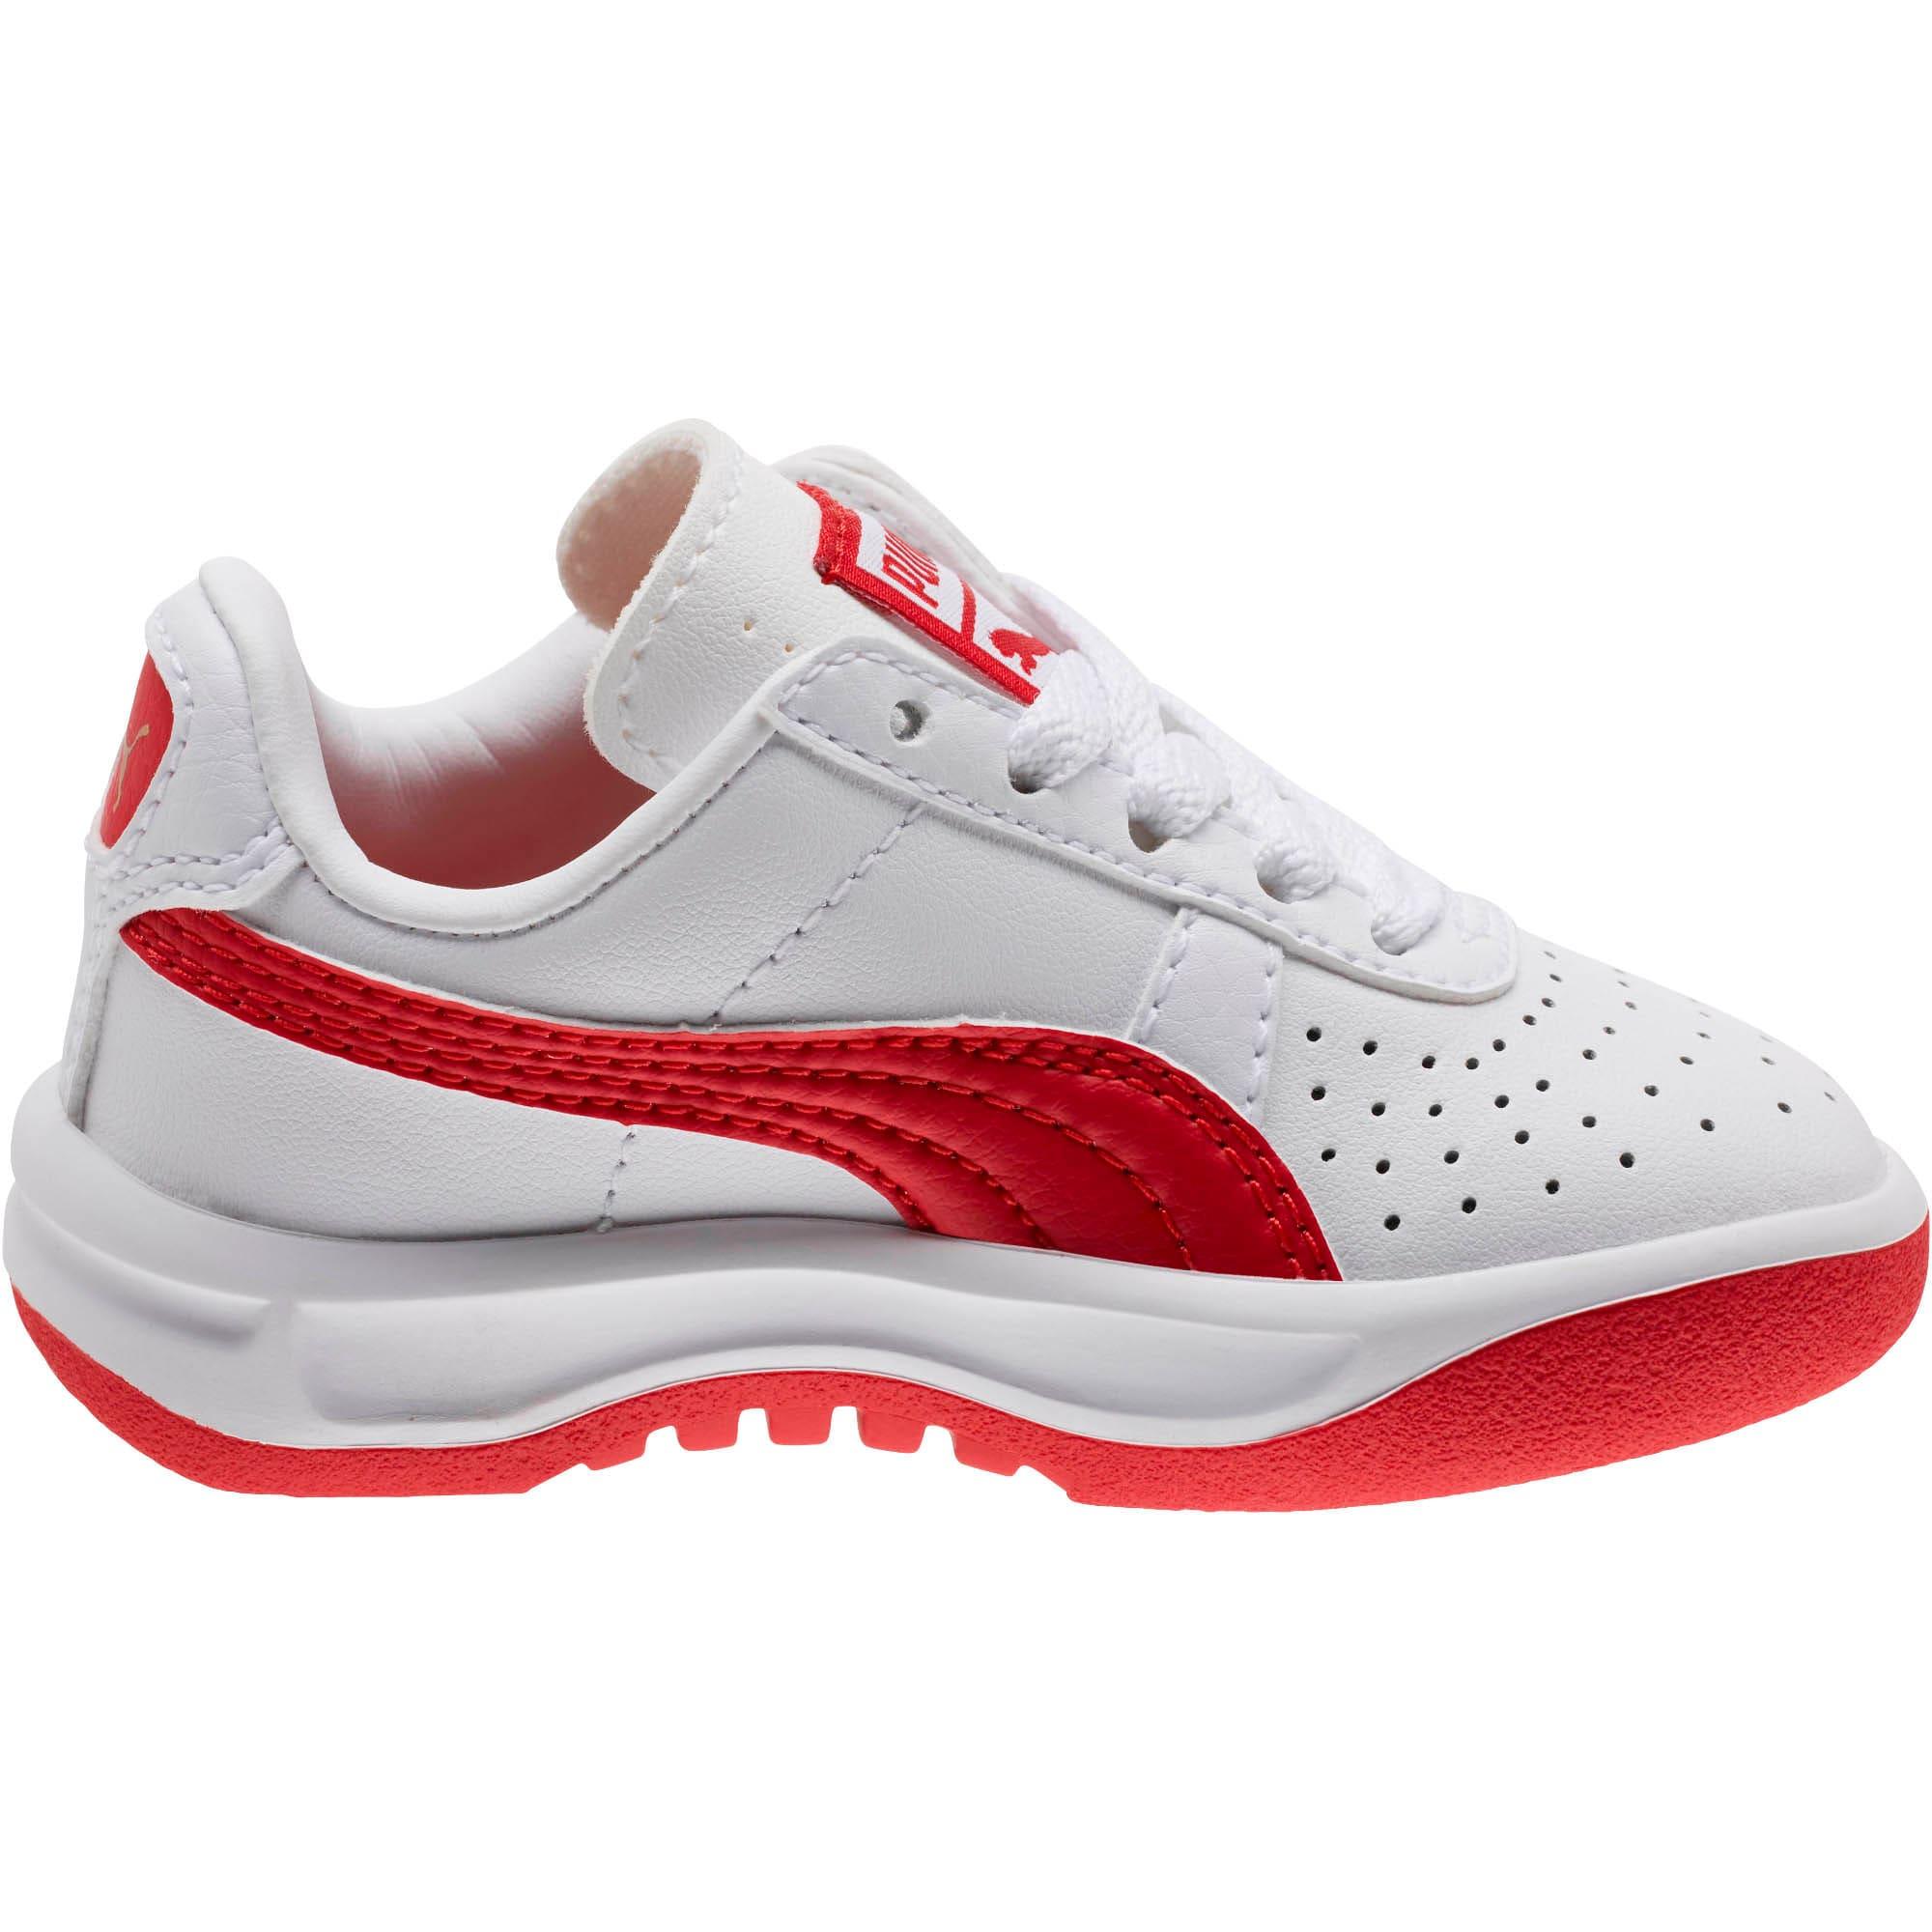 Thumbnail 3 of GV Special Toddler Shoes, Puma White-Ribbon Red, medium